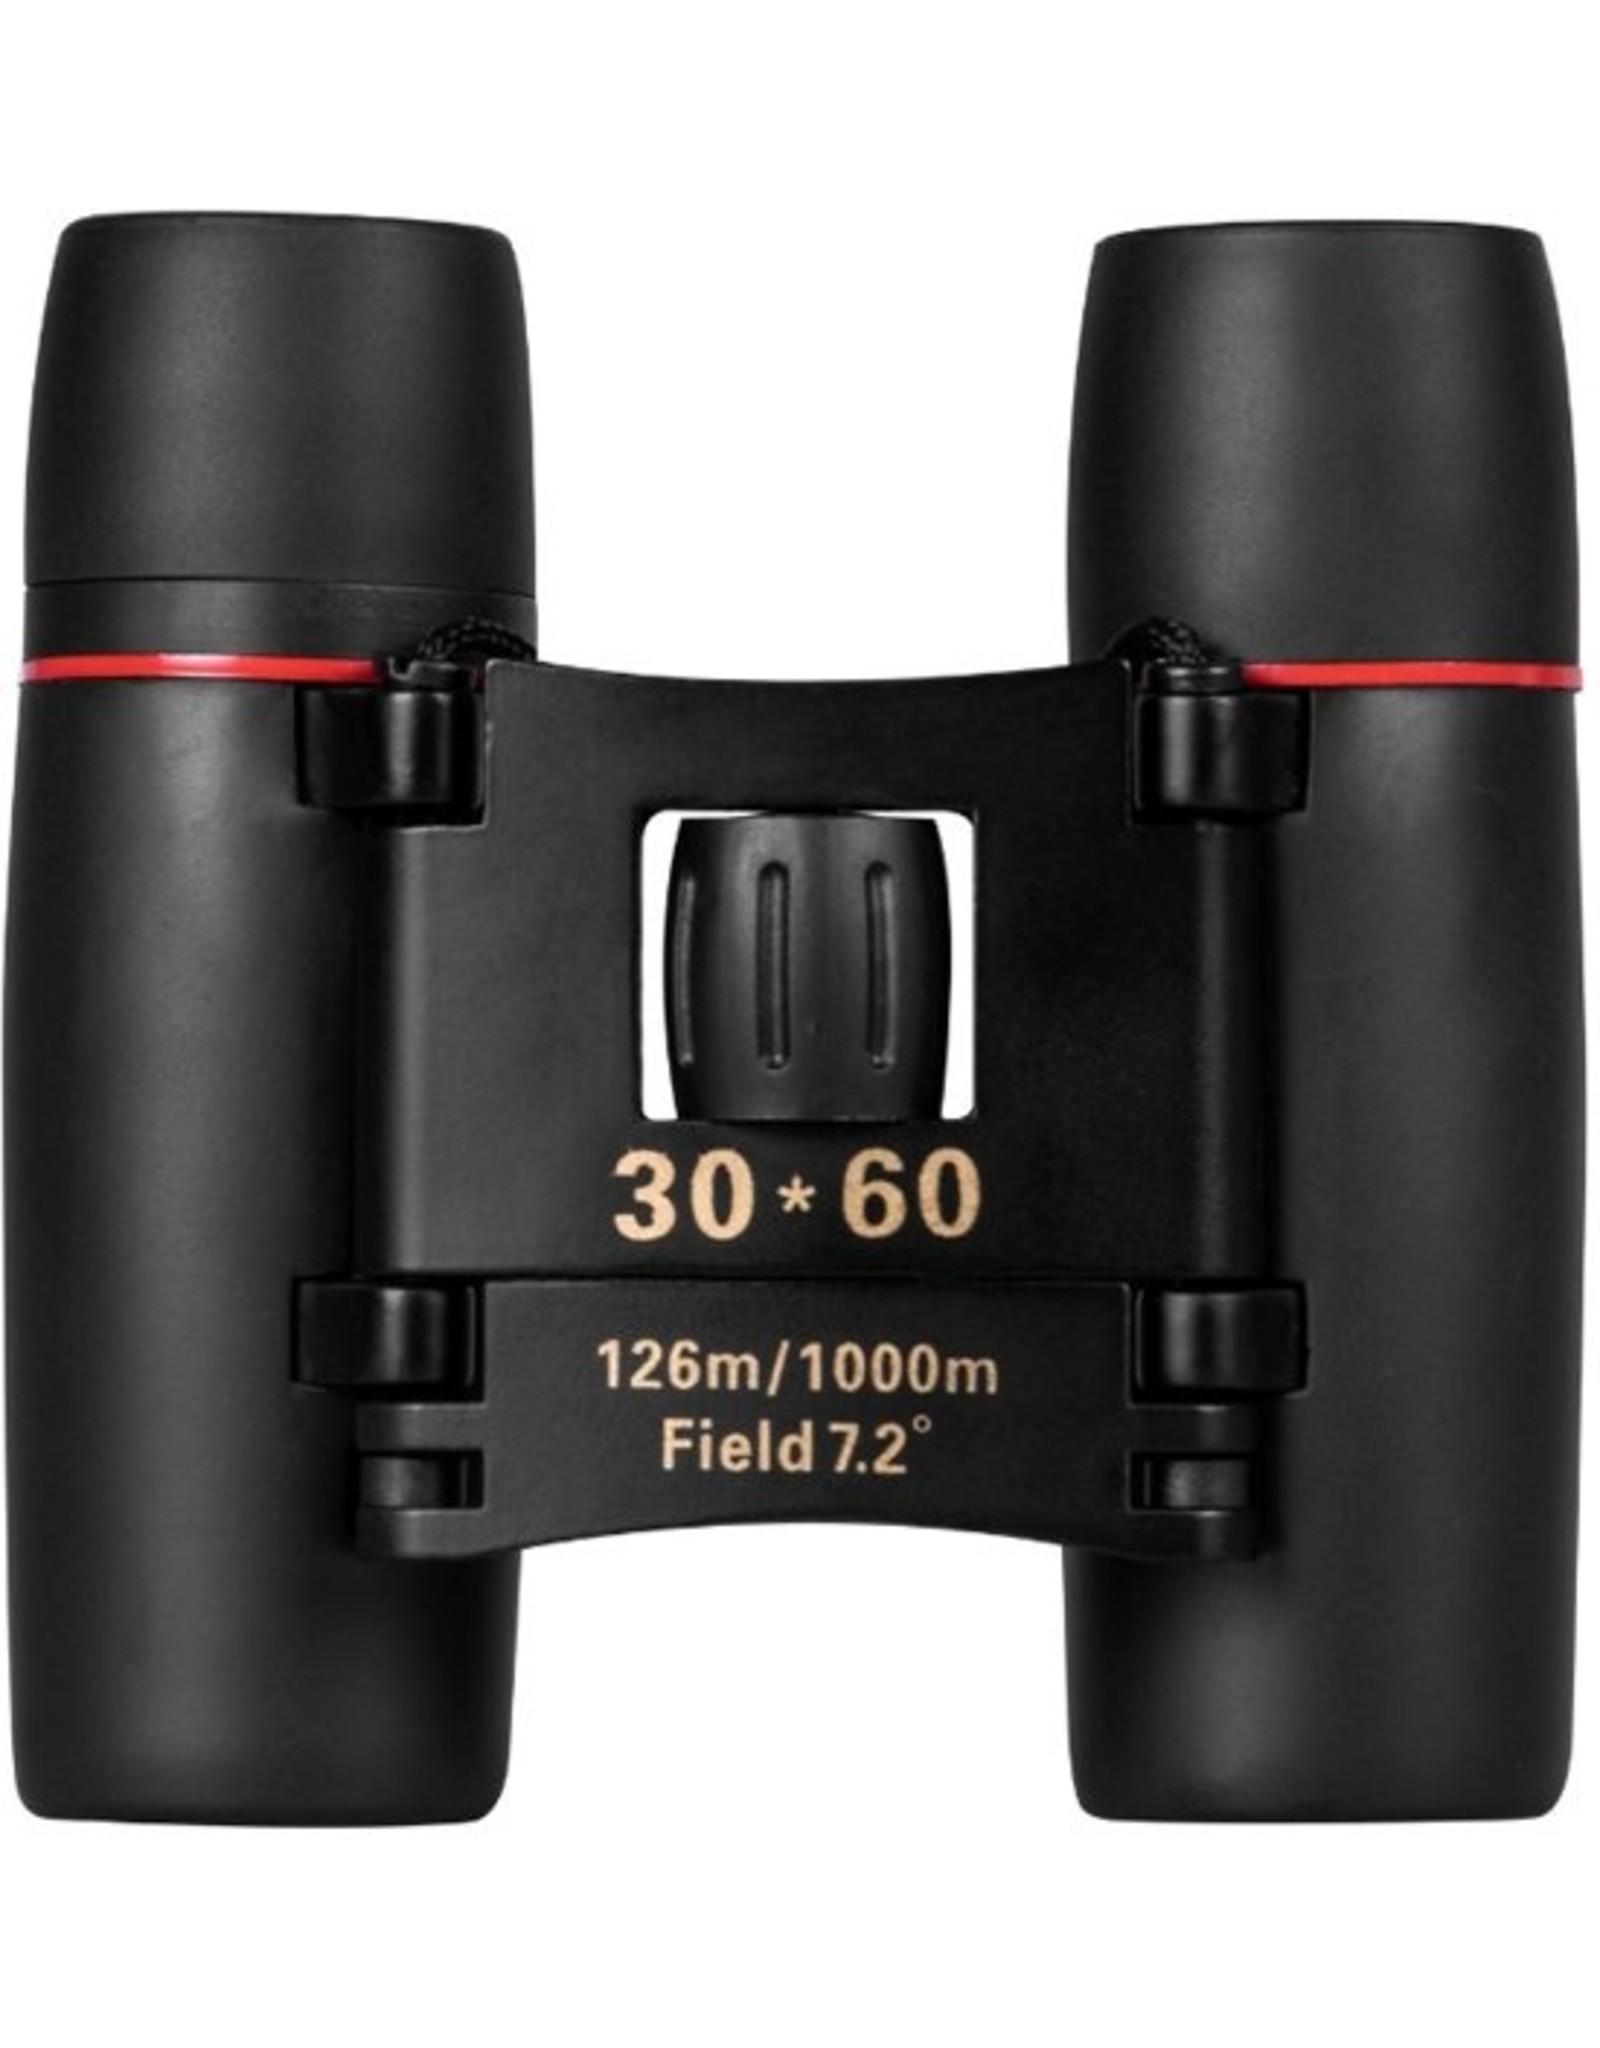 Parya Official  Binoculars with night vision